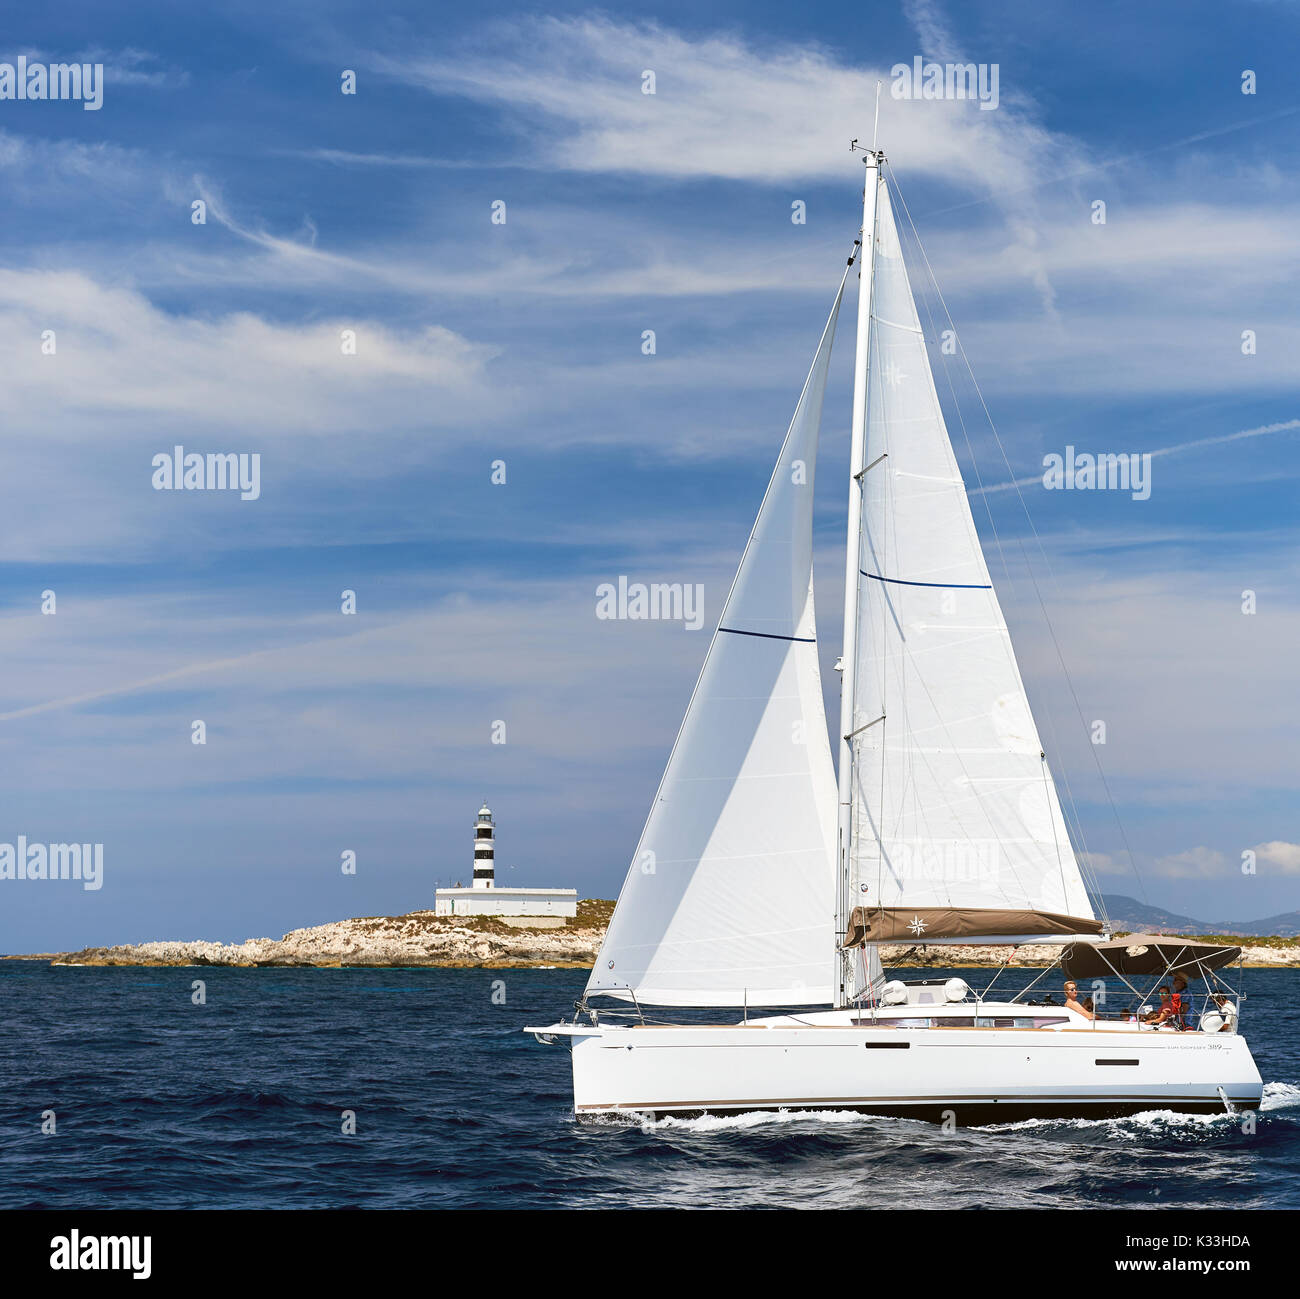 Ibiza, Spain - June 10, 2017: White sailboat Sun Odyssey 389 in the Mediterranean sea. Ibiza, Balearic Islands Spain - Stock Image